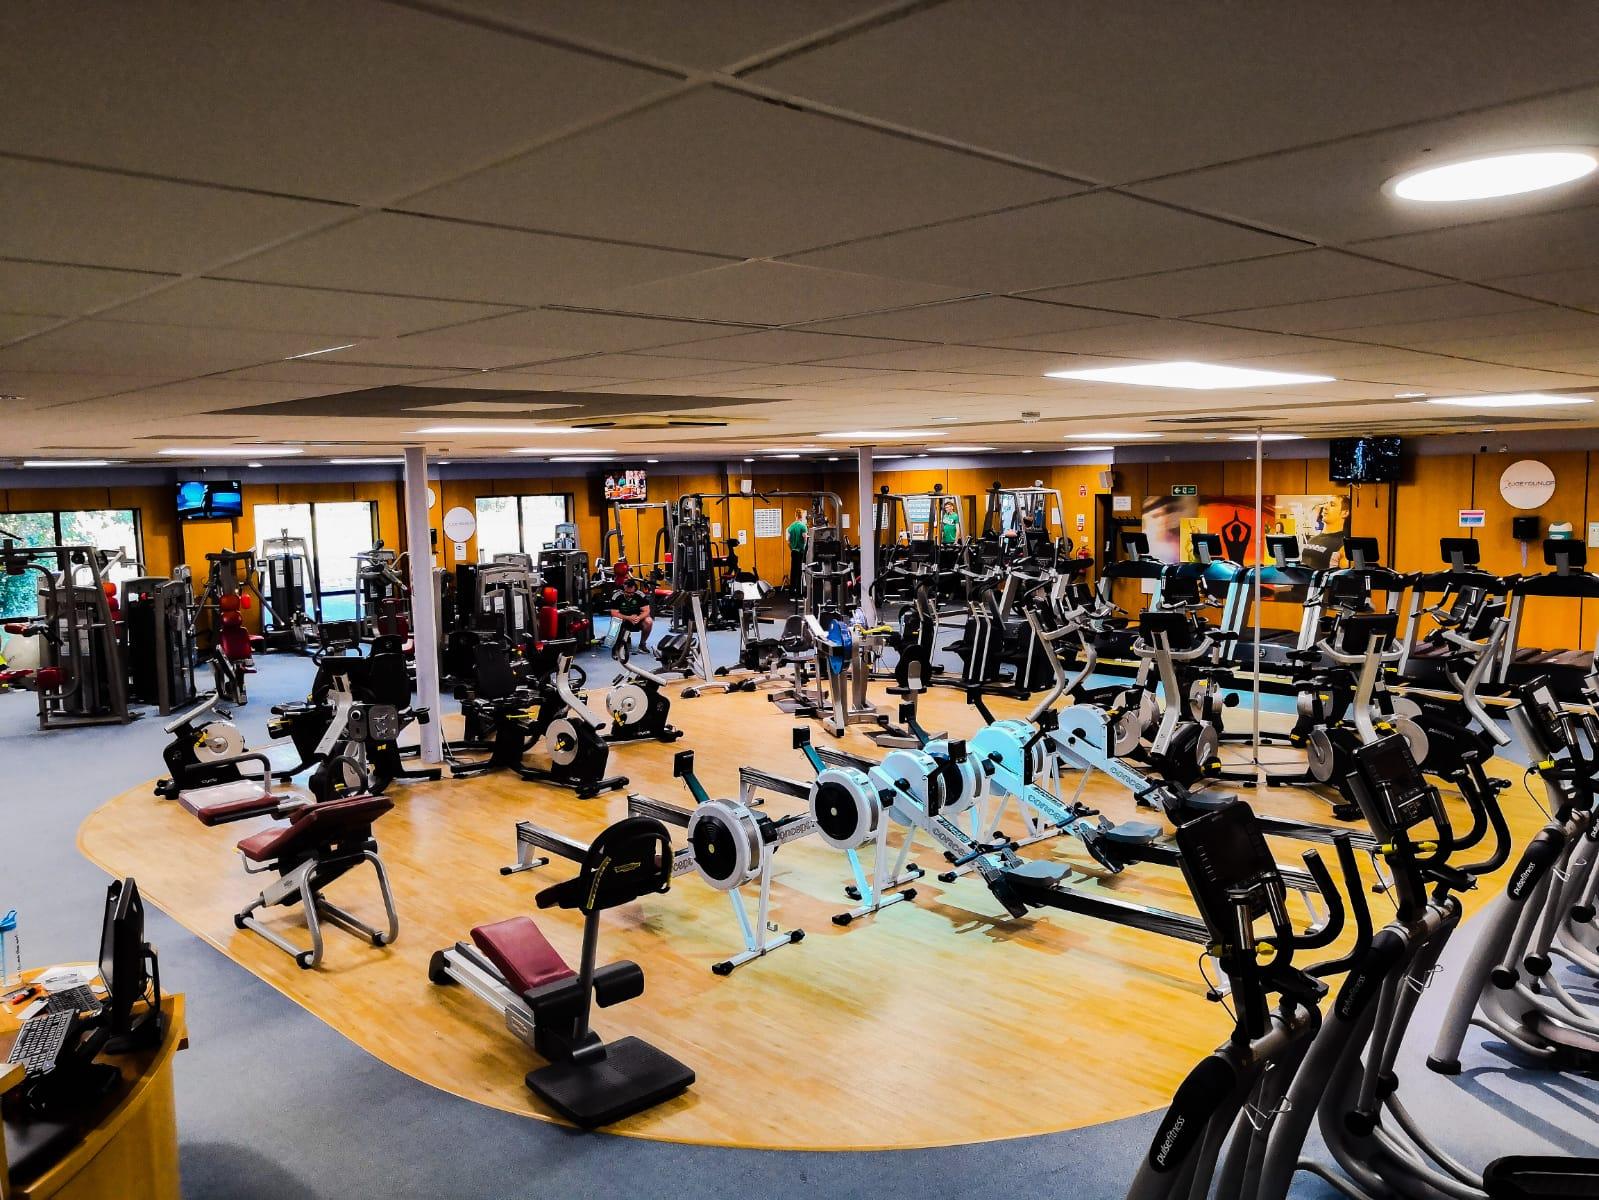 Jdlc gym 5